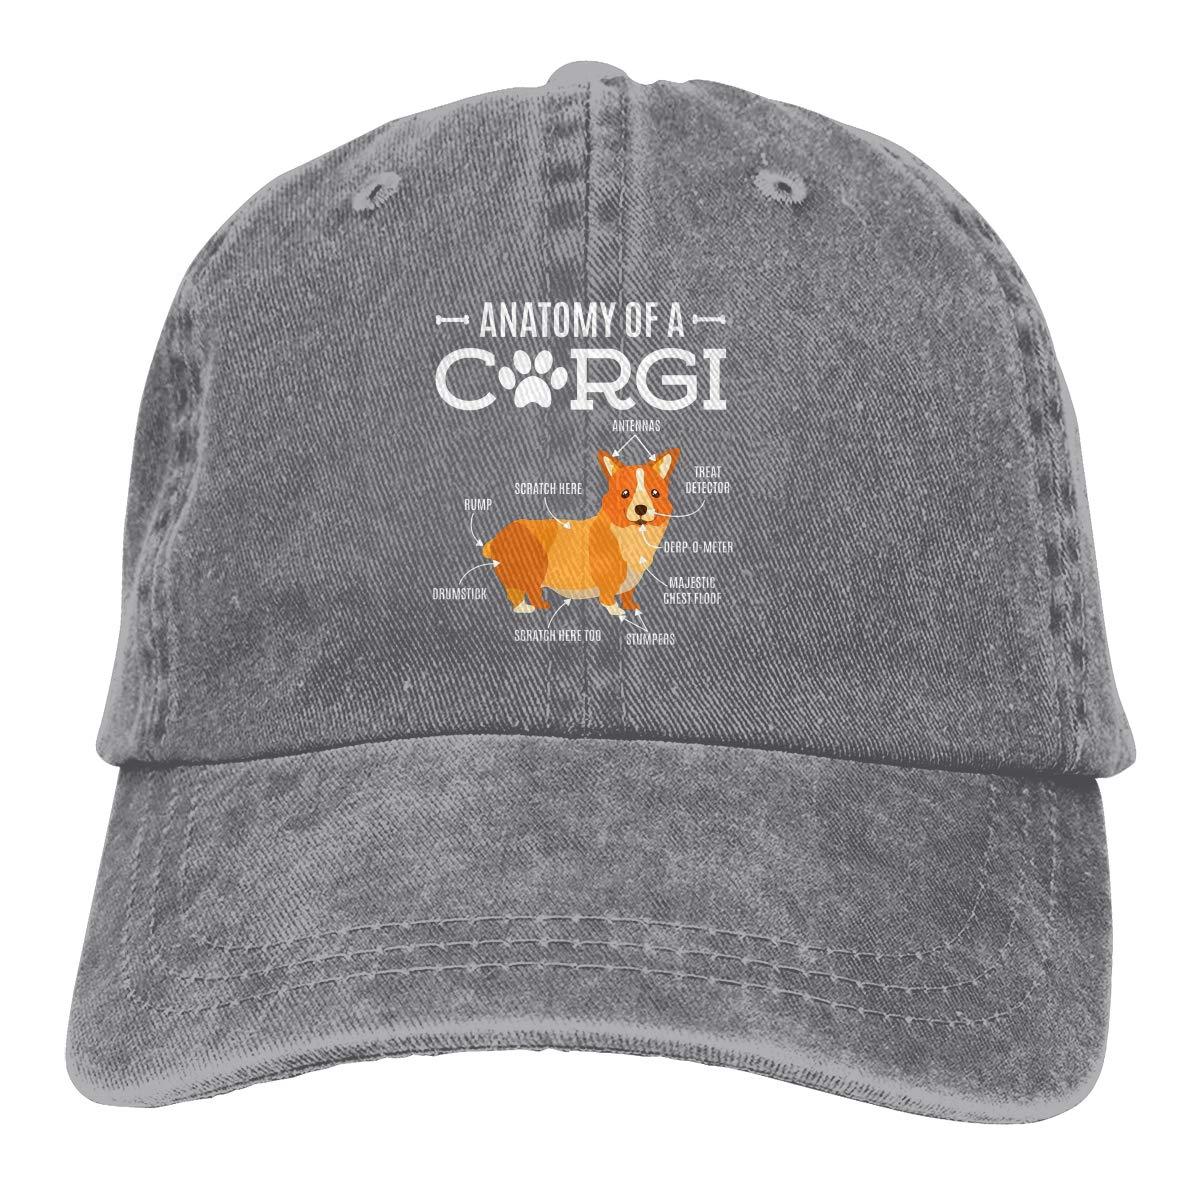 Anatomy of A Corgi Fashion Adjustable Cowboy Cap Baseball Cap for Women and Men